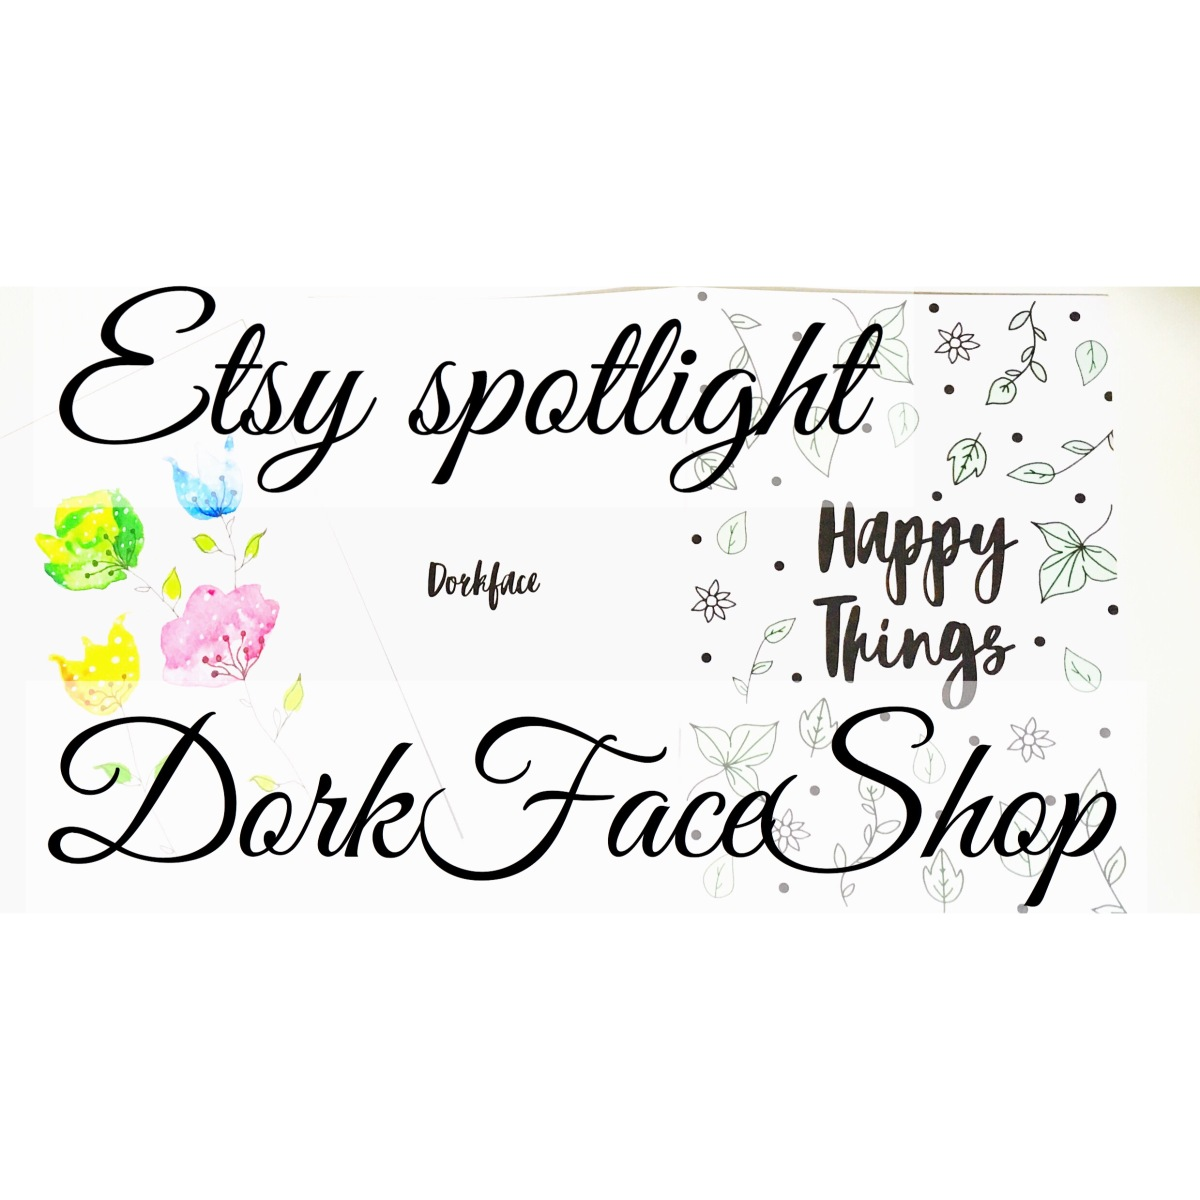 Etsy spotlight: Dorkfaceshop